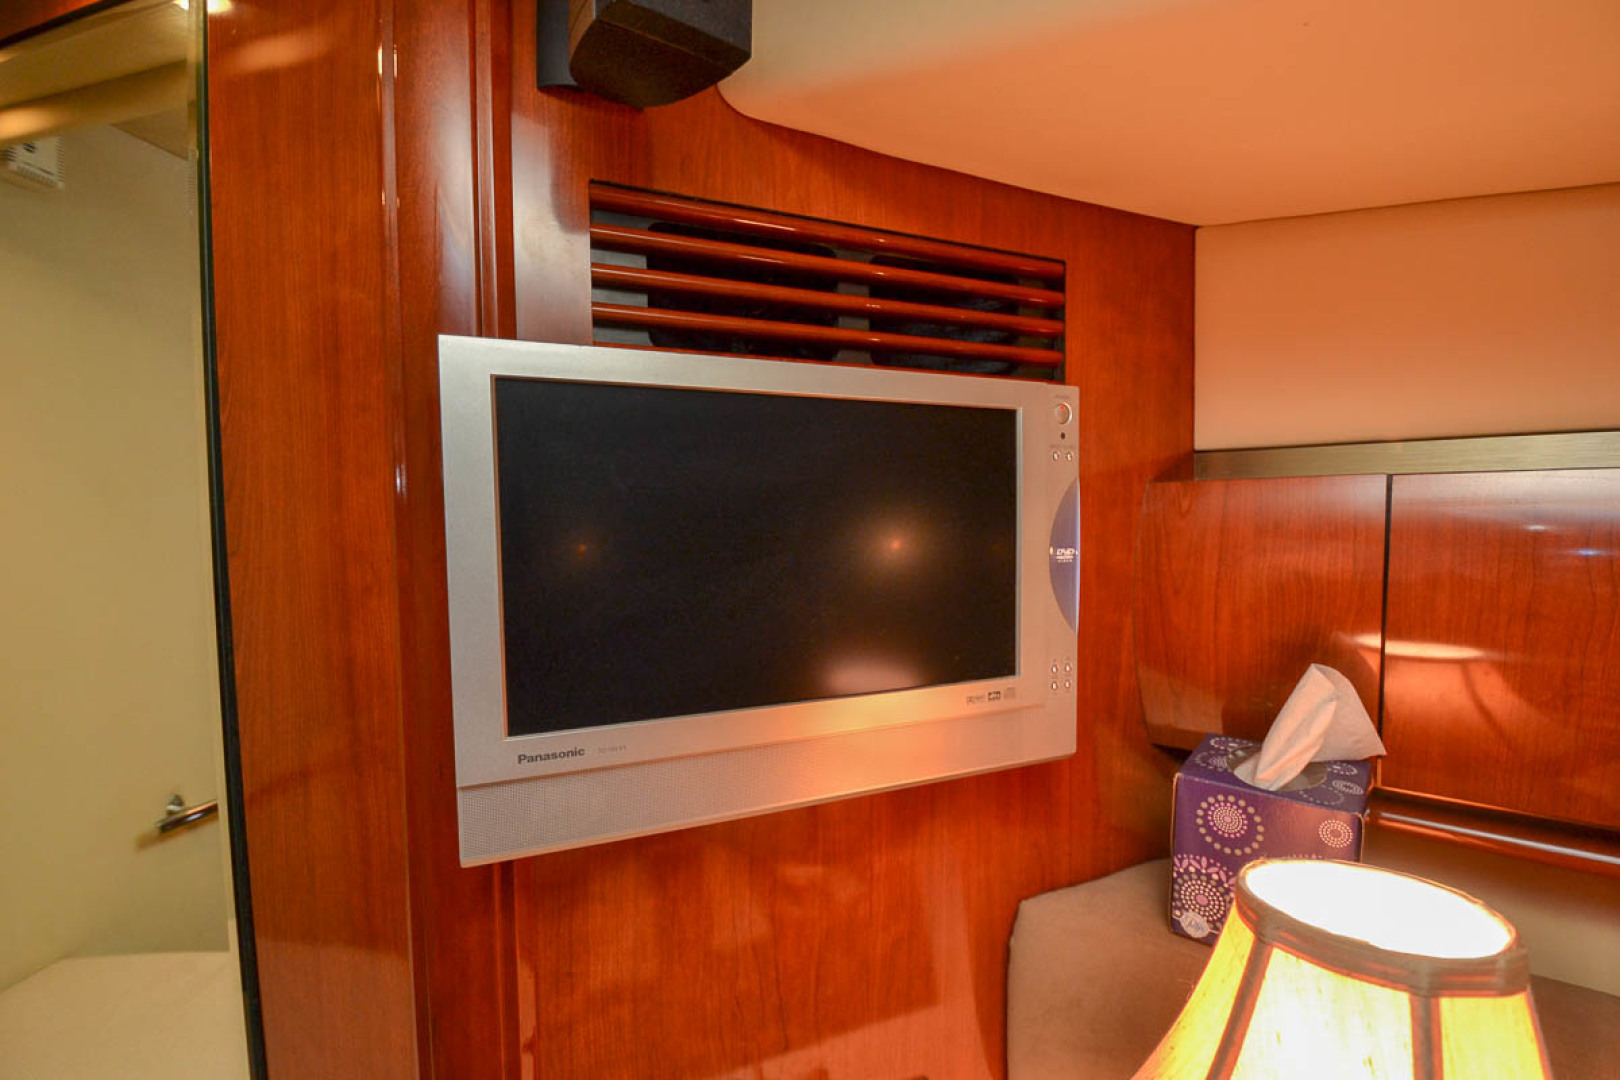 Flatpanel TV